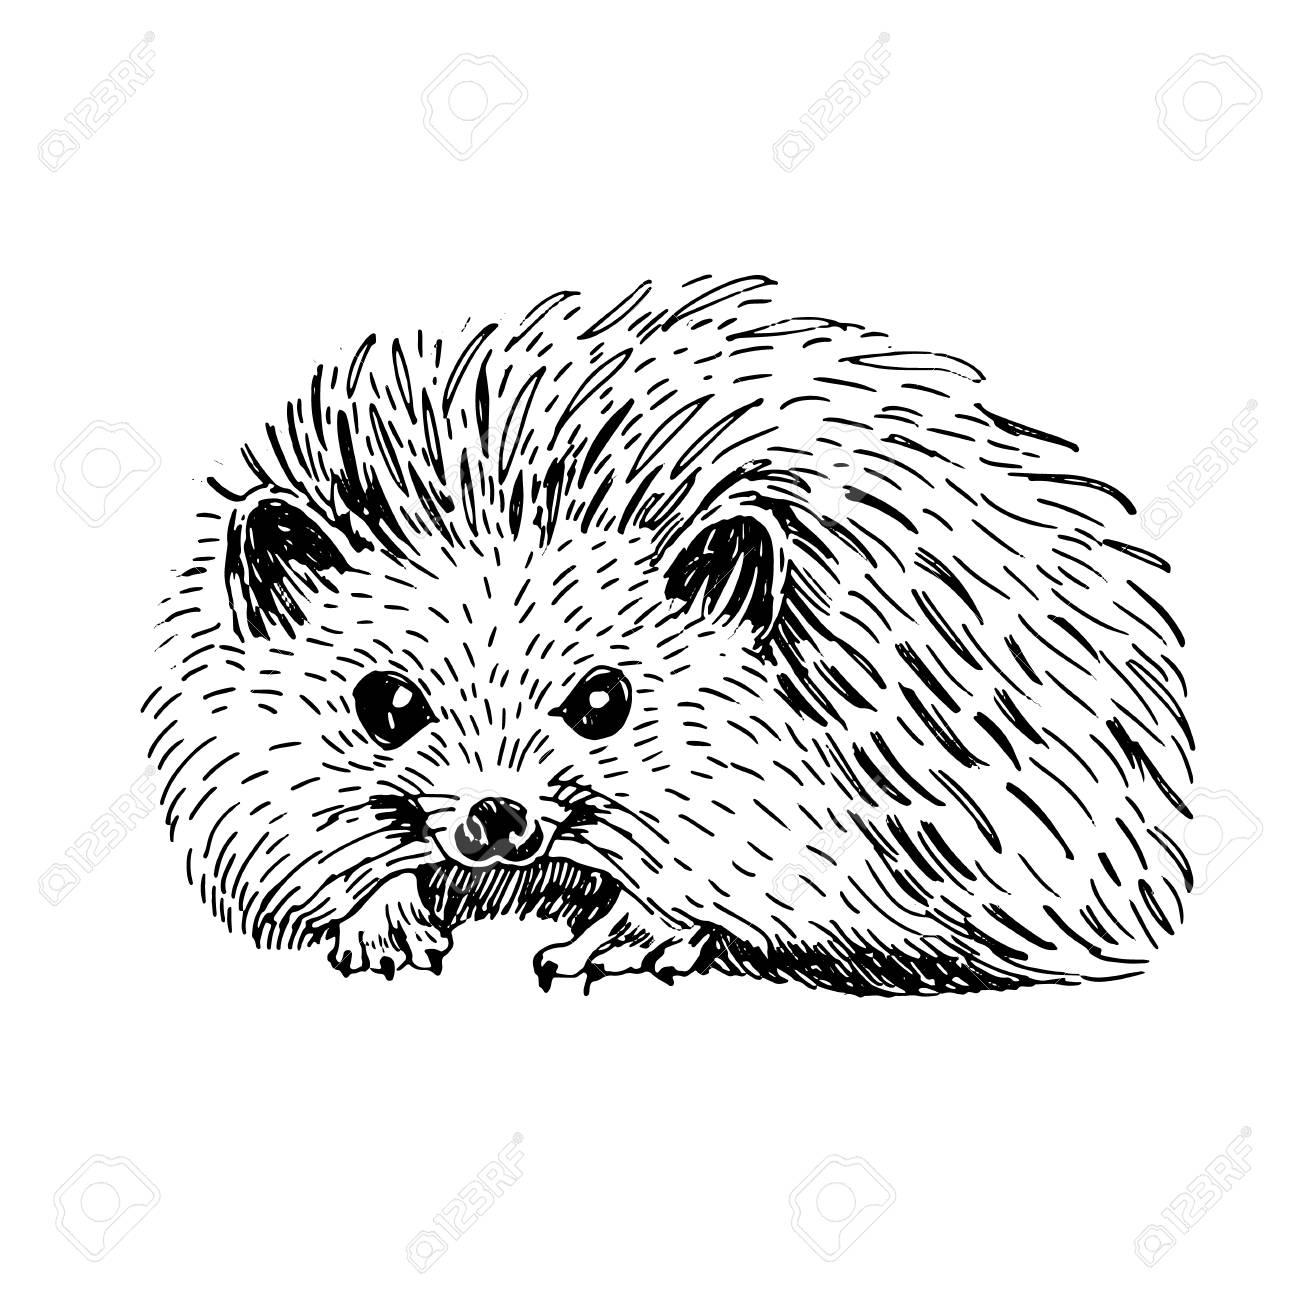 Hedgehog clipart drawn. Sketch line art drawing